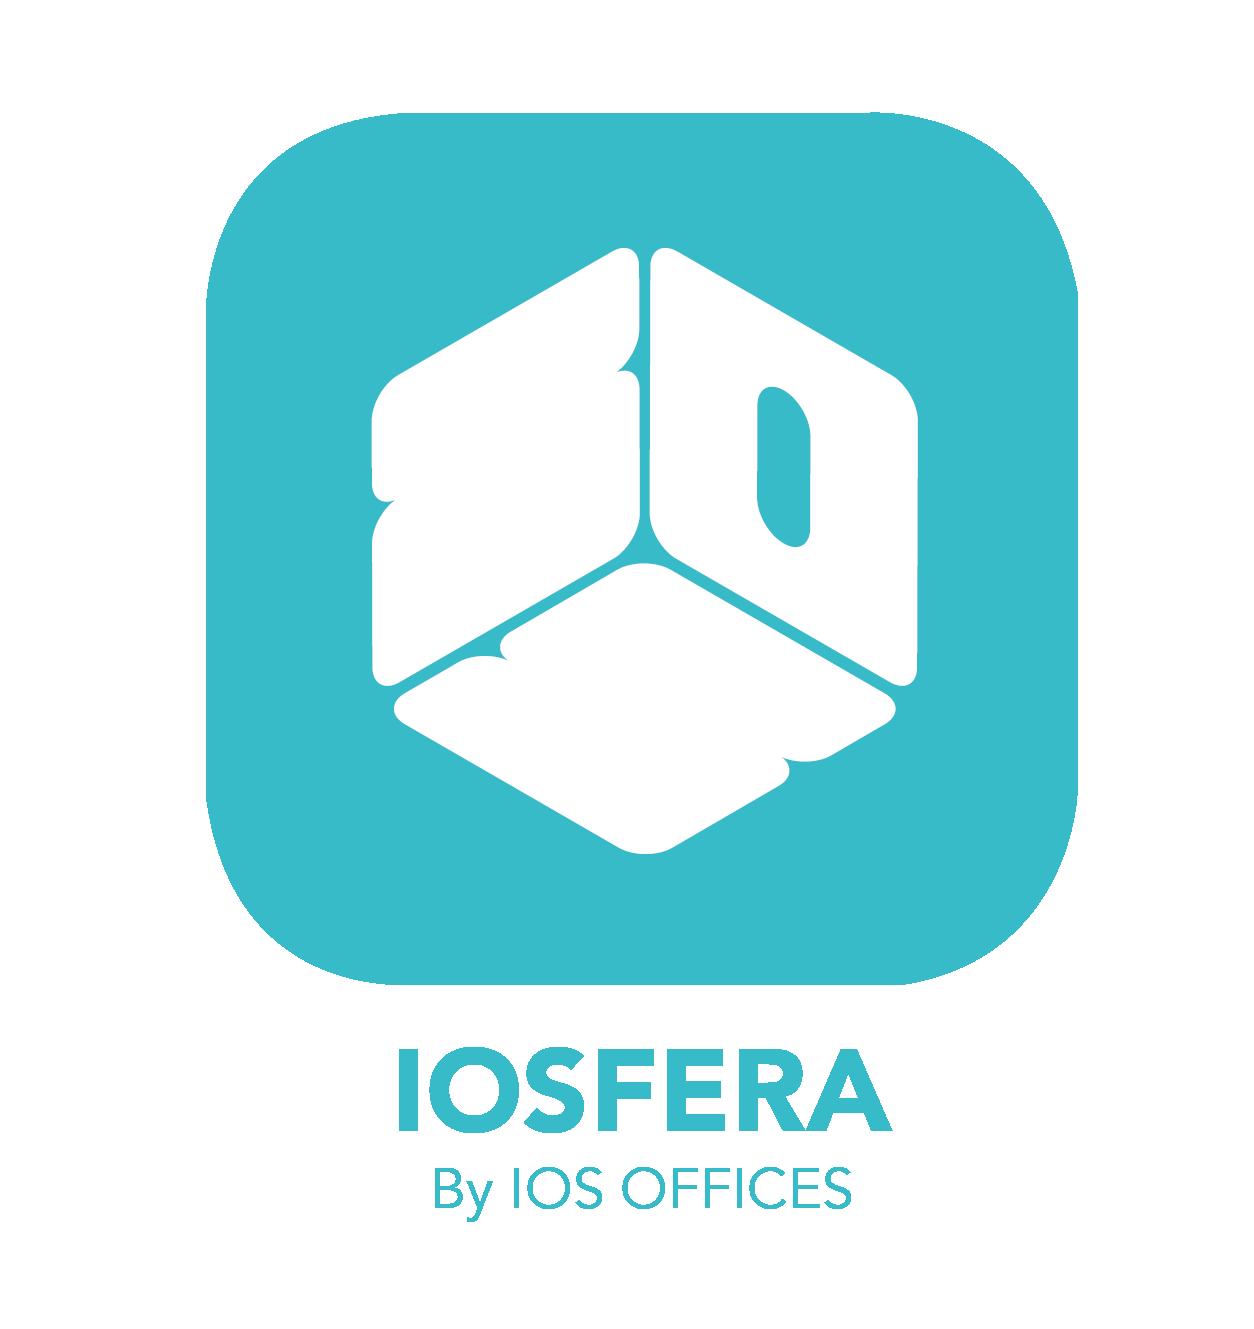 IOSFERA-01.png